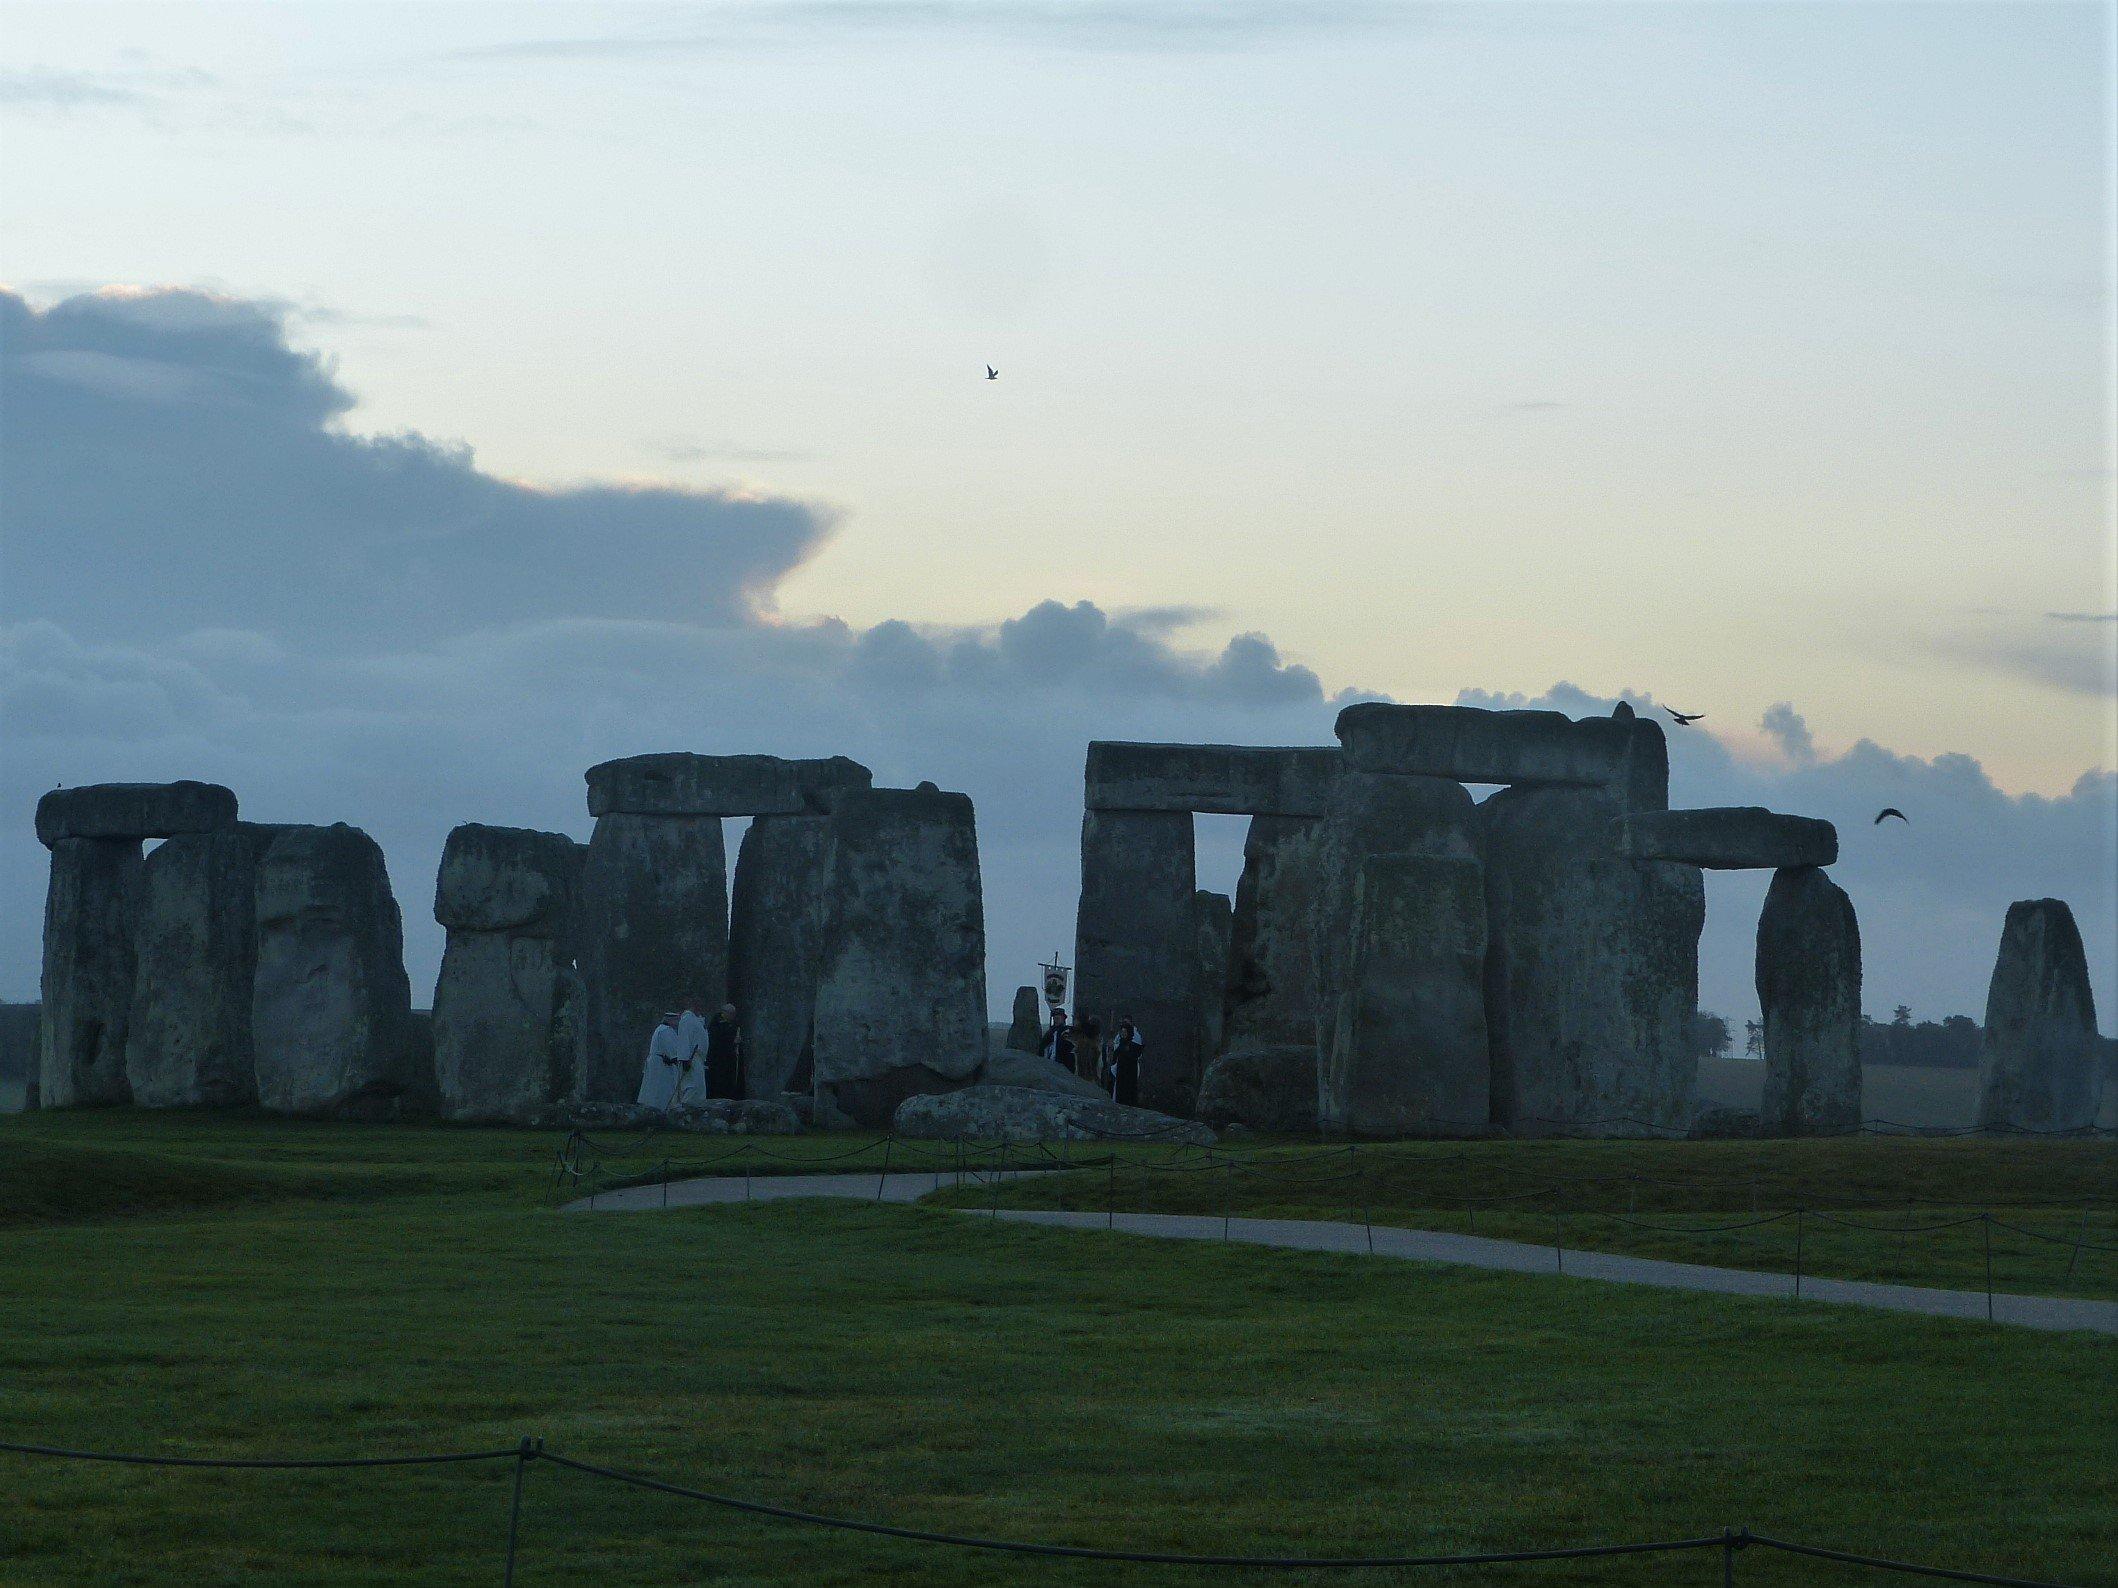 People congregating inside Stonehenge in winter